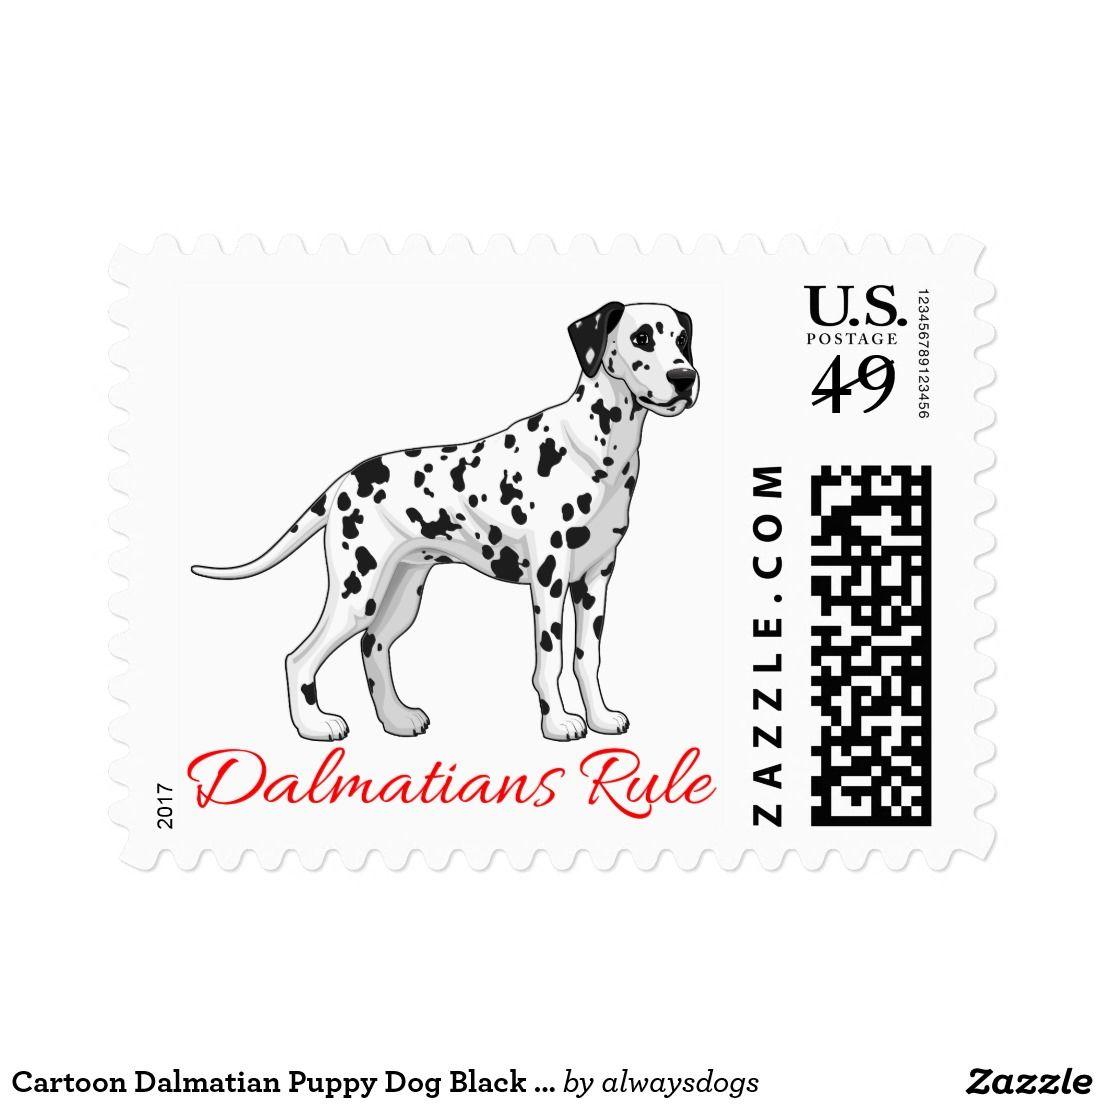 Cartoon Dalmatian Puppy Dog Black White Spots Postage Dalmatian Puppy Dogs And Puppies Puppies